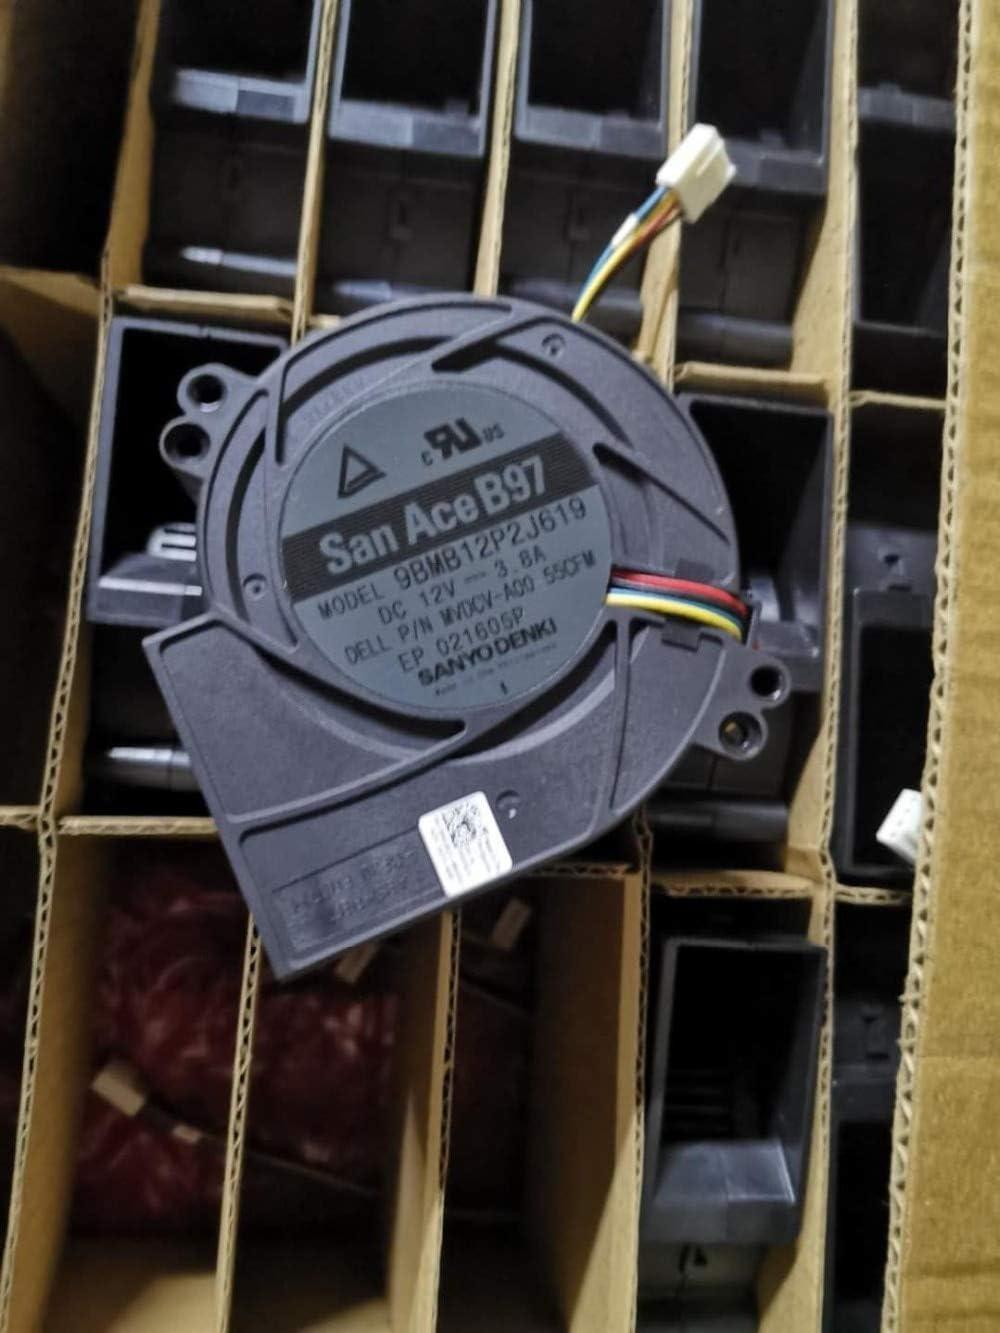 New Original fan for SANYO San Ace B97 9BMB12P2J619 DC12V 3.8A MVDCV-A00 55CFM 9733MM Computer cooling fan Blower